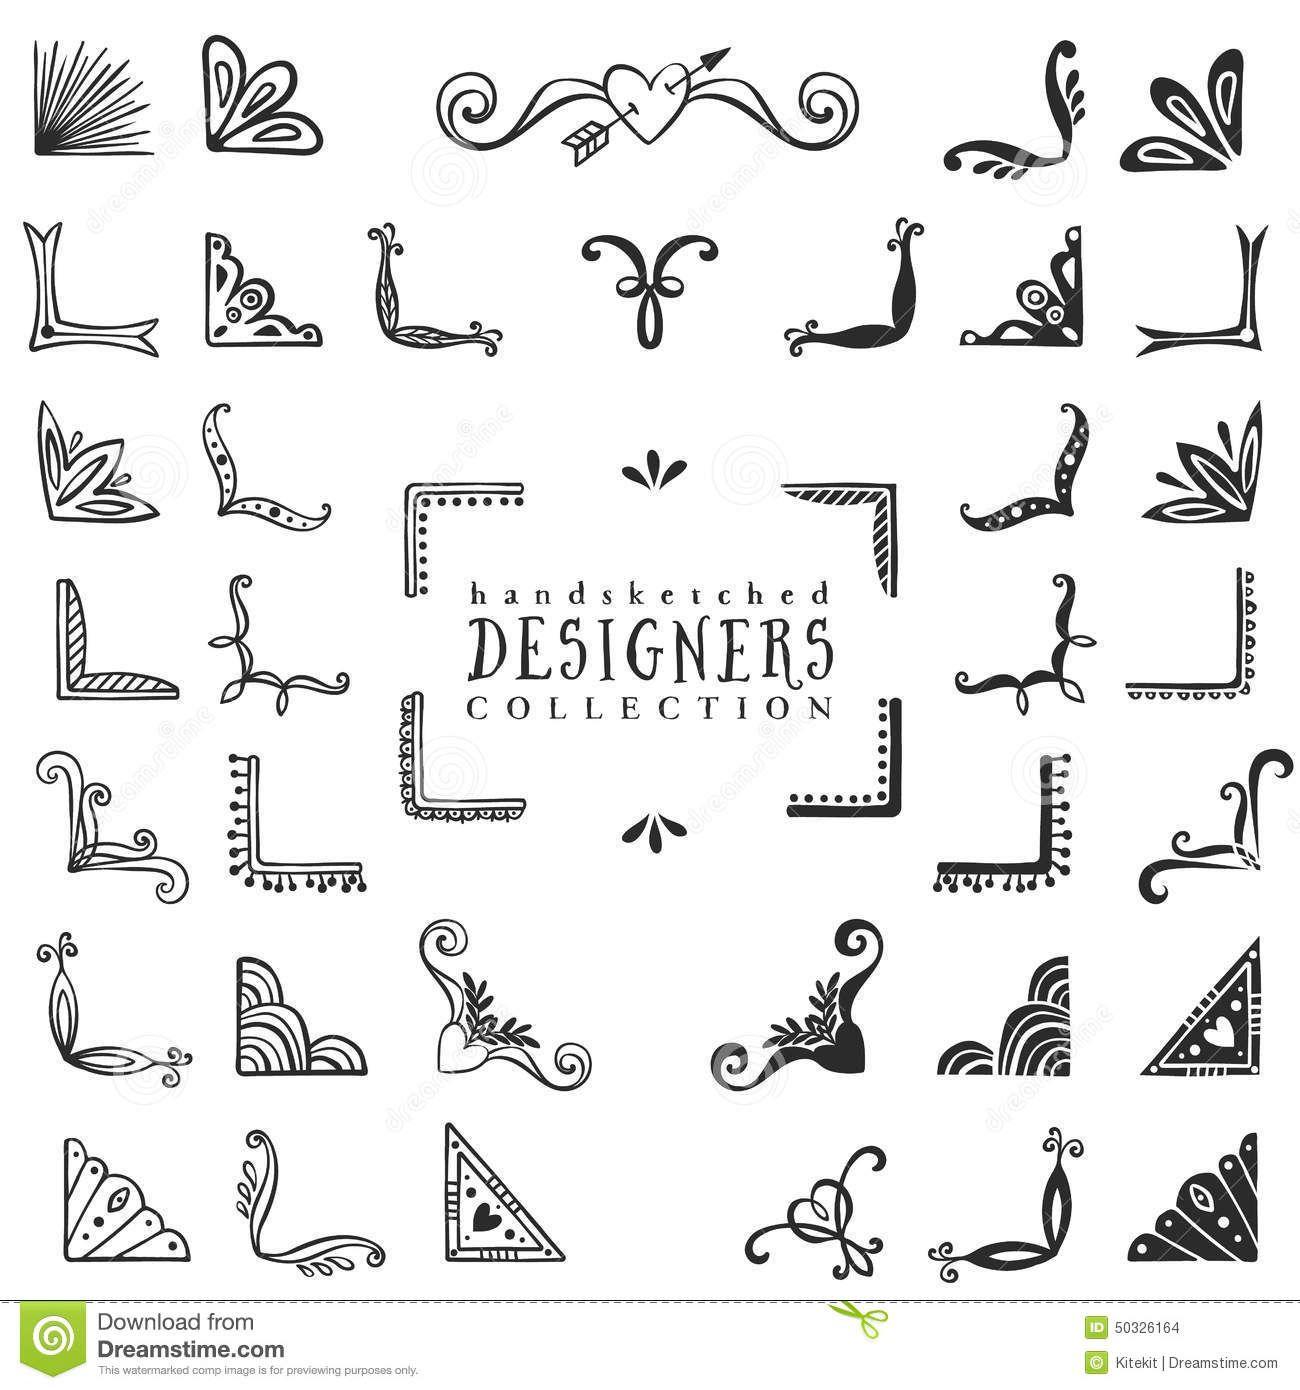 Vintage decorative corners collection hand drawn vector design